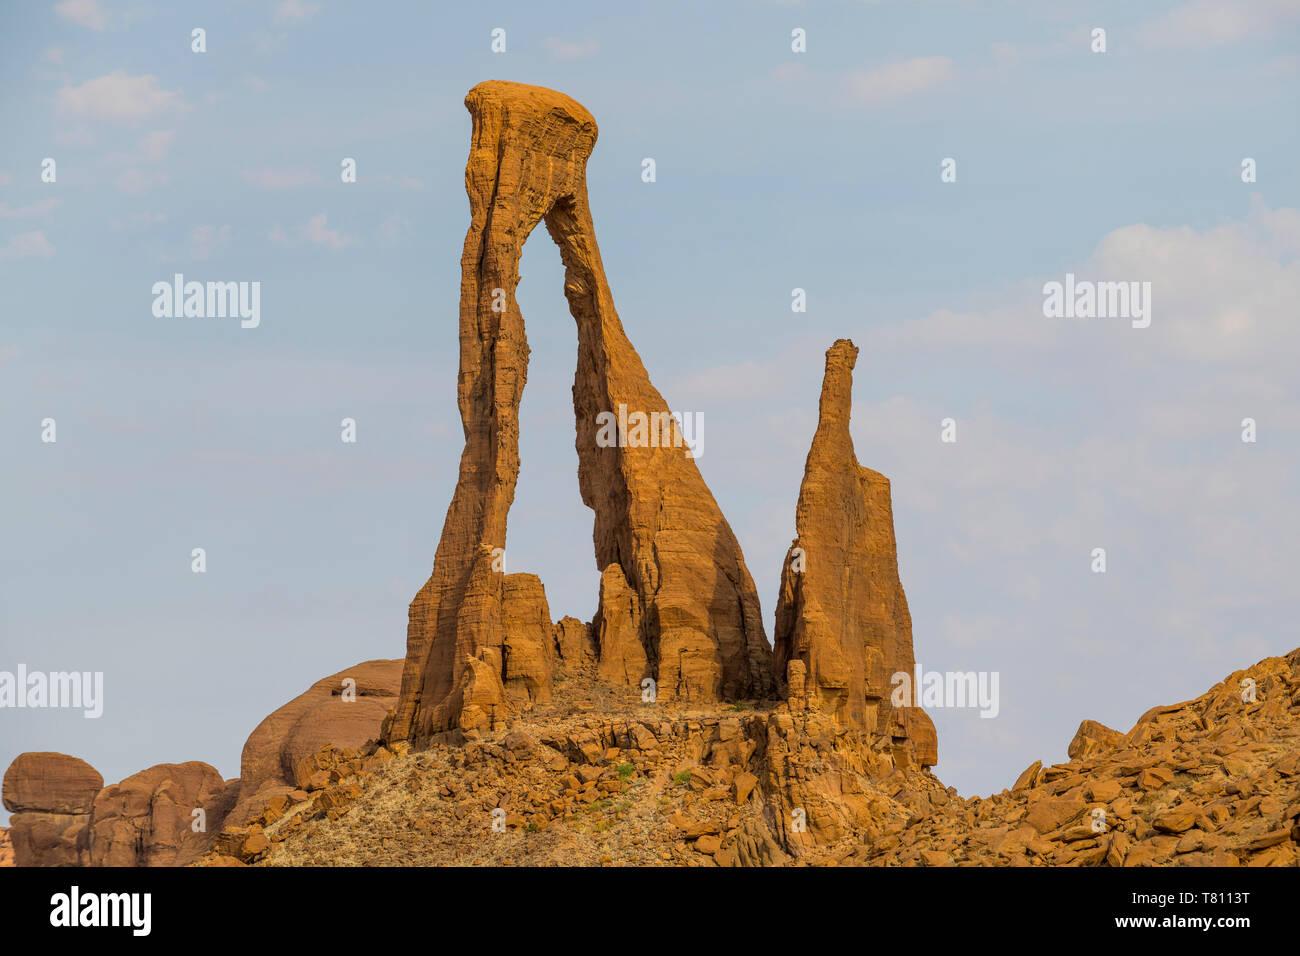 La Meseta de Ennedi, Sitio del Patrimonio Mundial de la UNESCO, la región de Ennedi, Chad, África Foto de stock